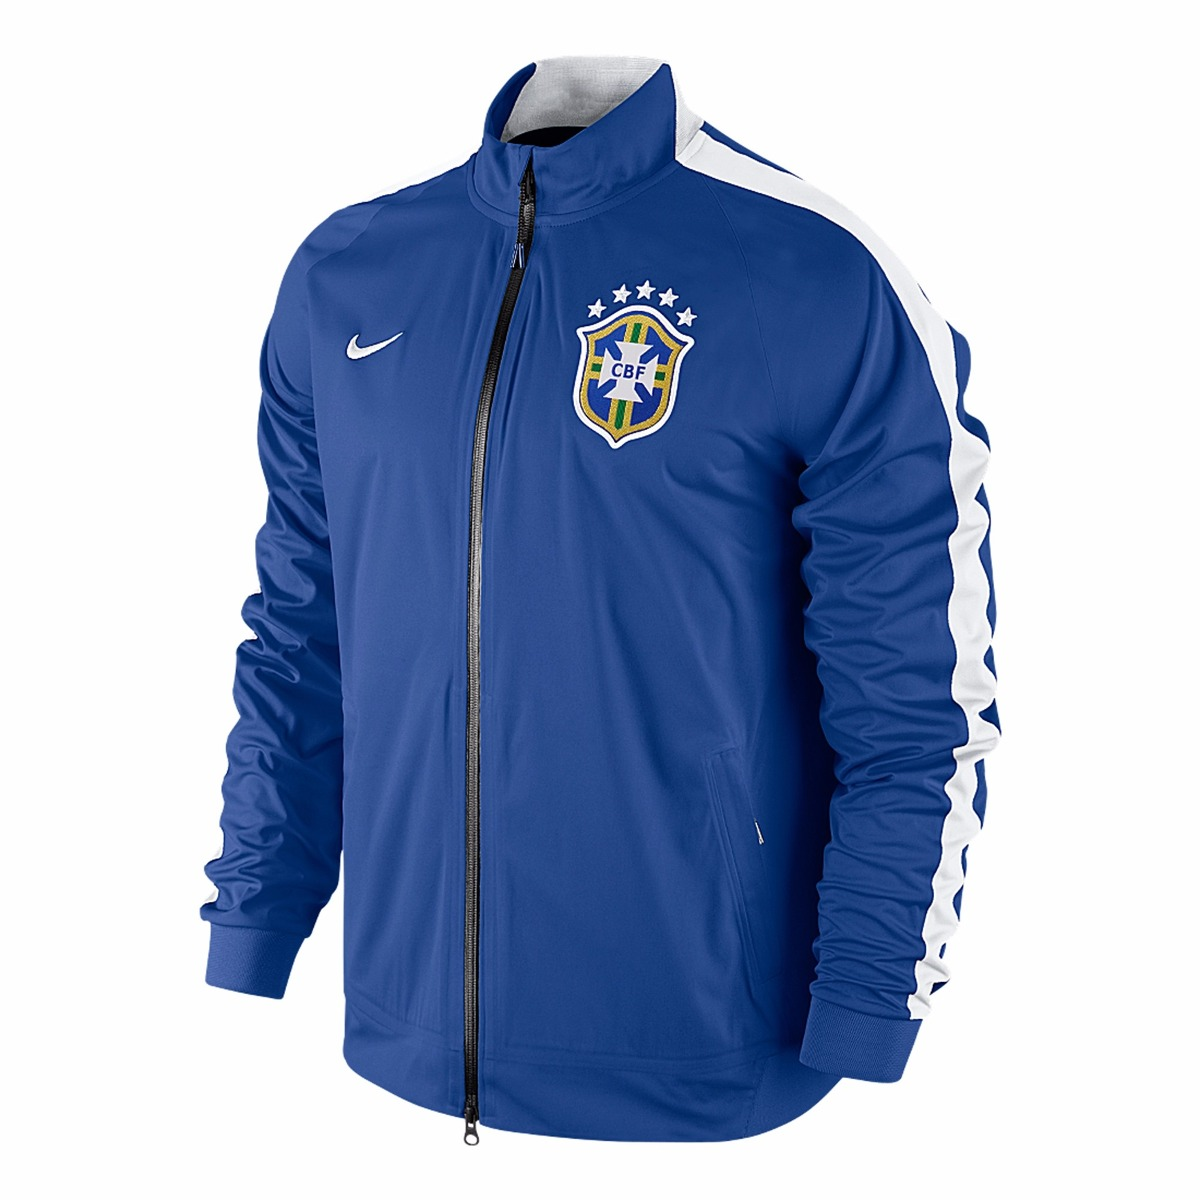 Jaqueta Nike Olimpíadas 16 Brasil Cbf Impermeável De 799 P  - R  268 ... 9cbb365c1a705